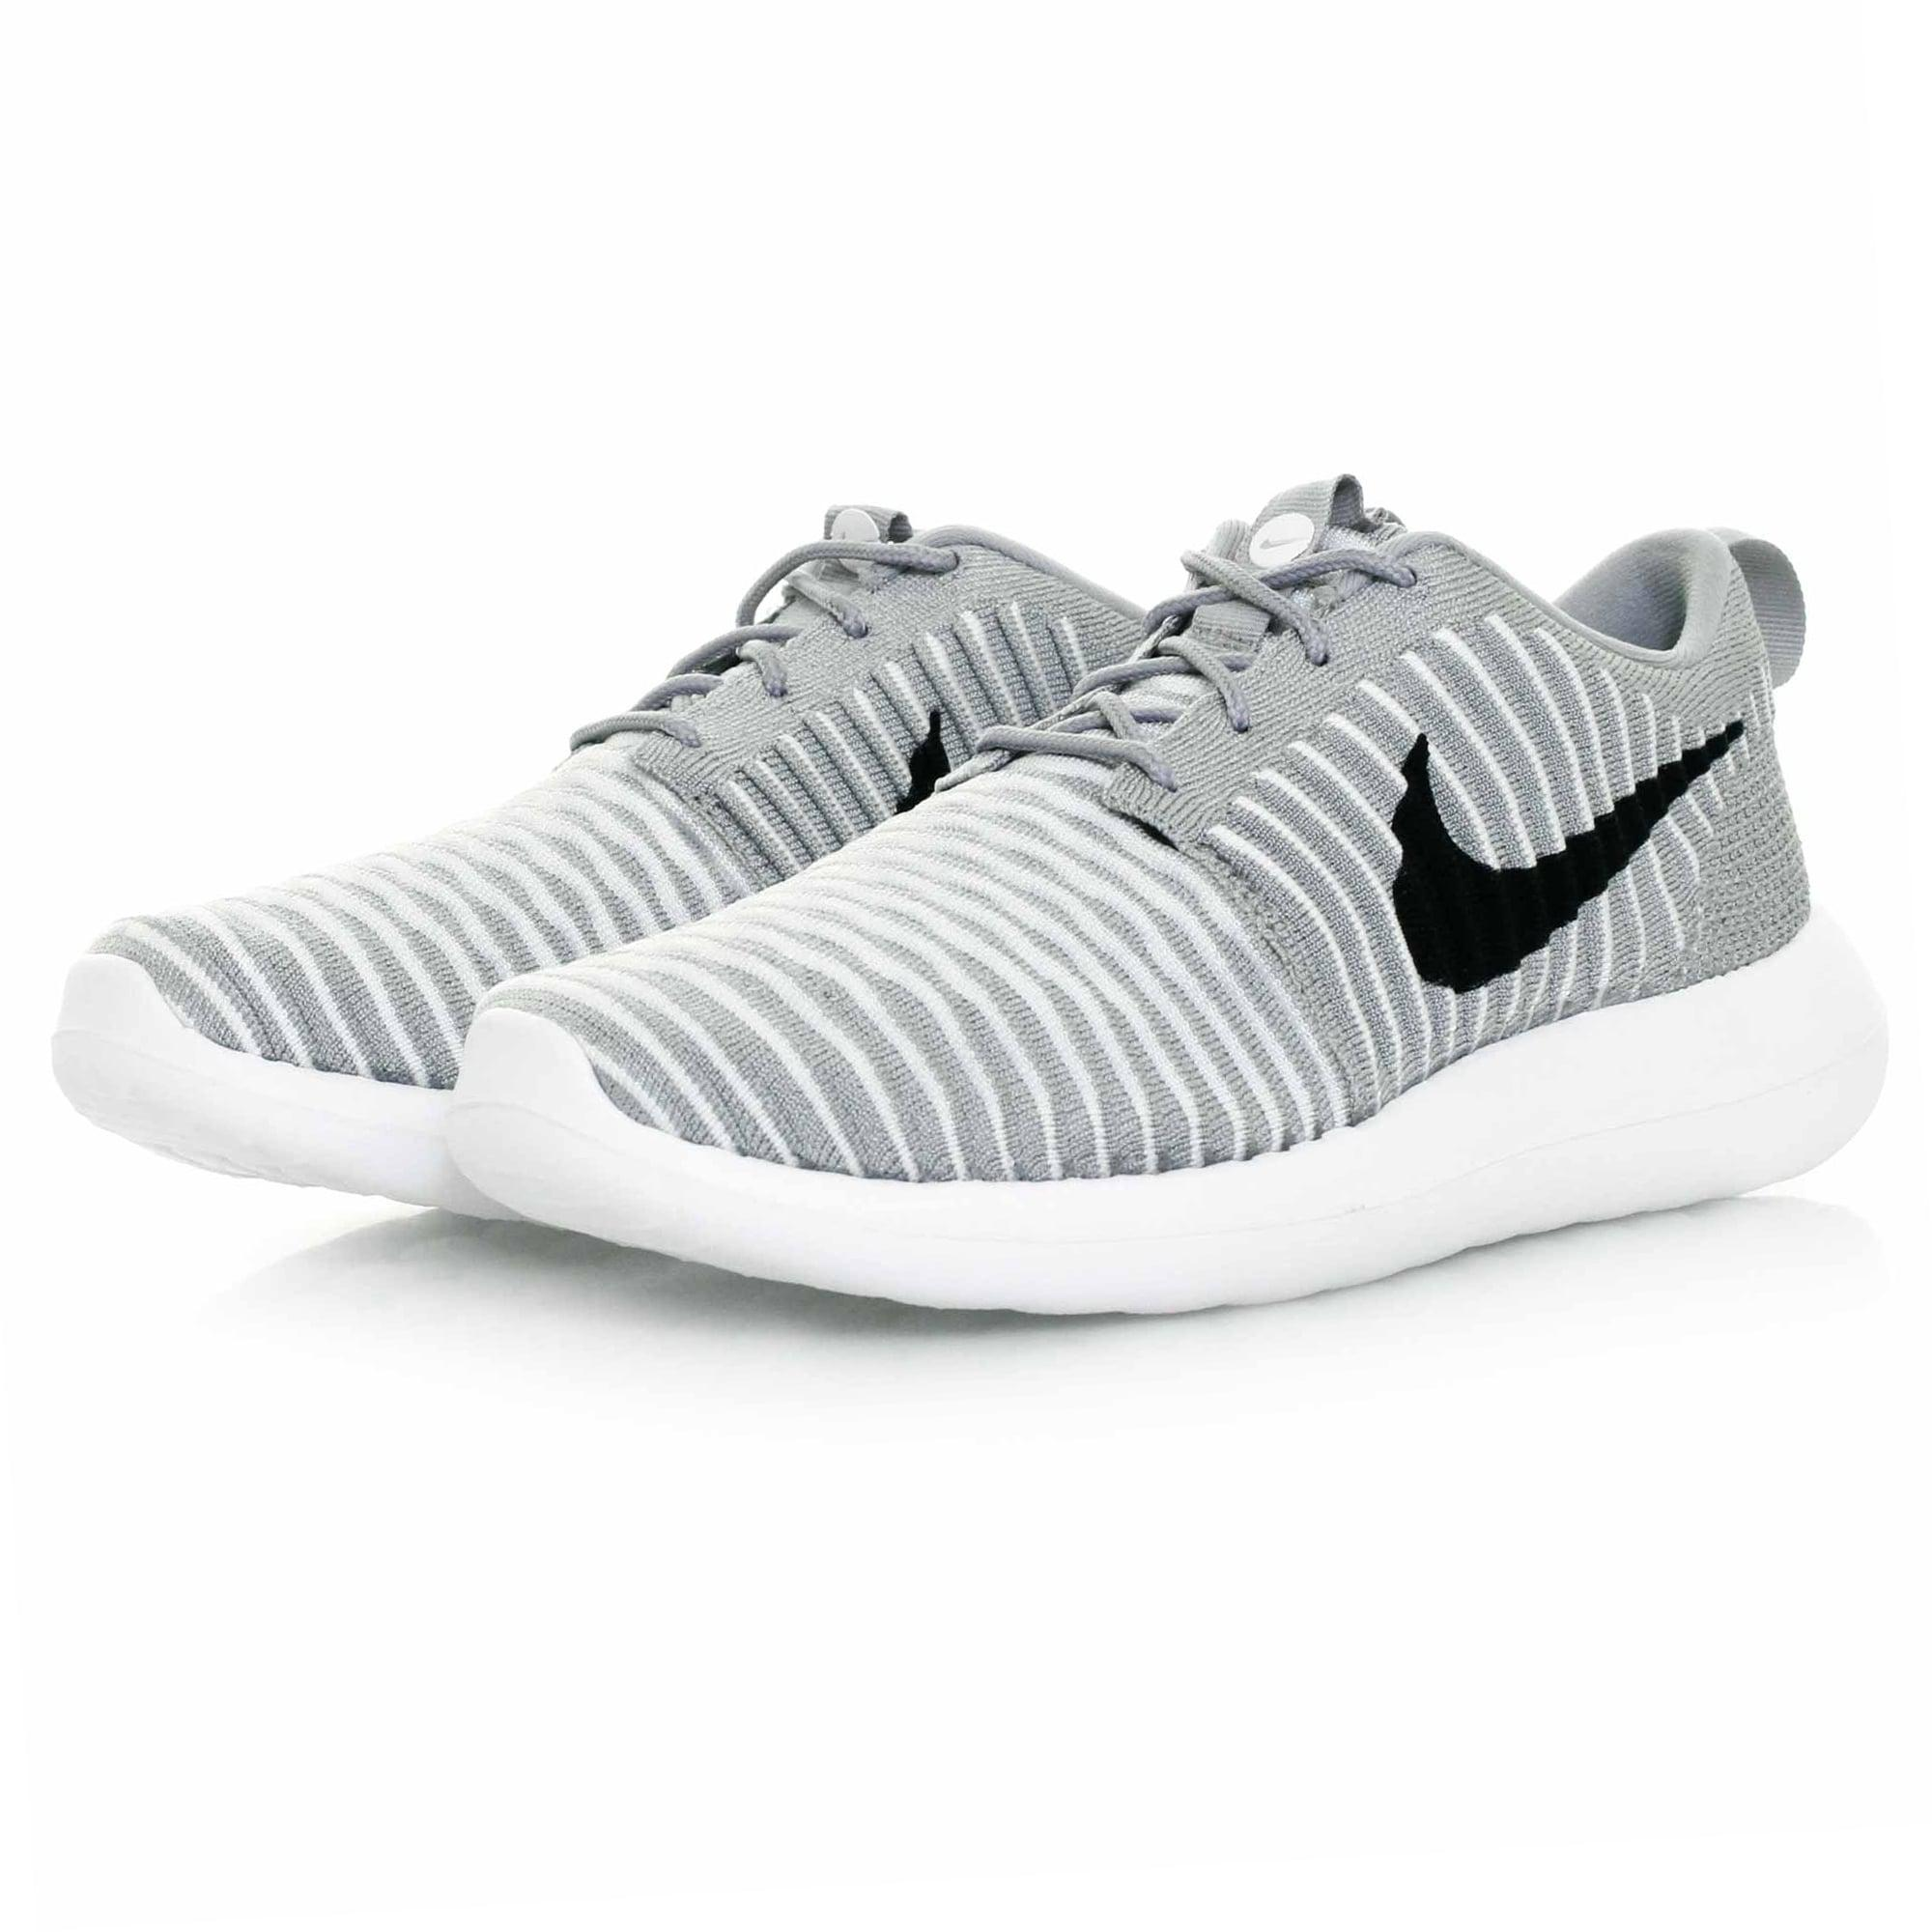 pretty nice e92b5 2f0e9 Lyst - Nike Roshe Two Flyknit Wolf Grey Shoe 844833 002 in Gray for Men